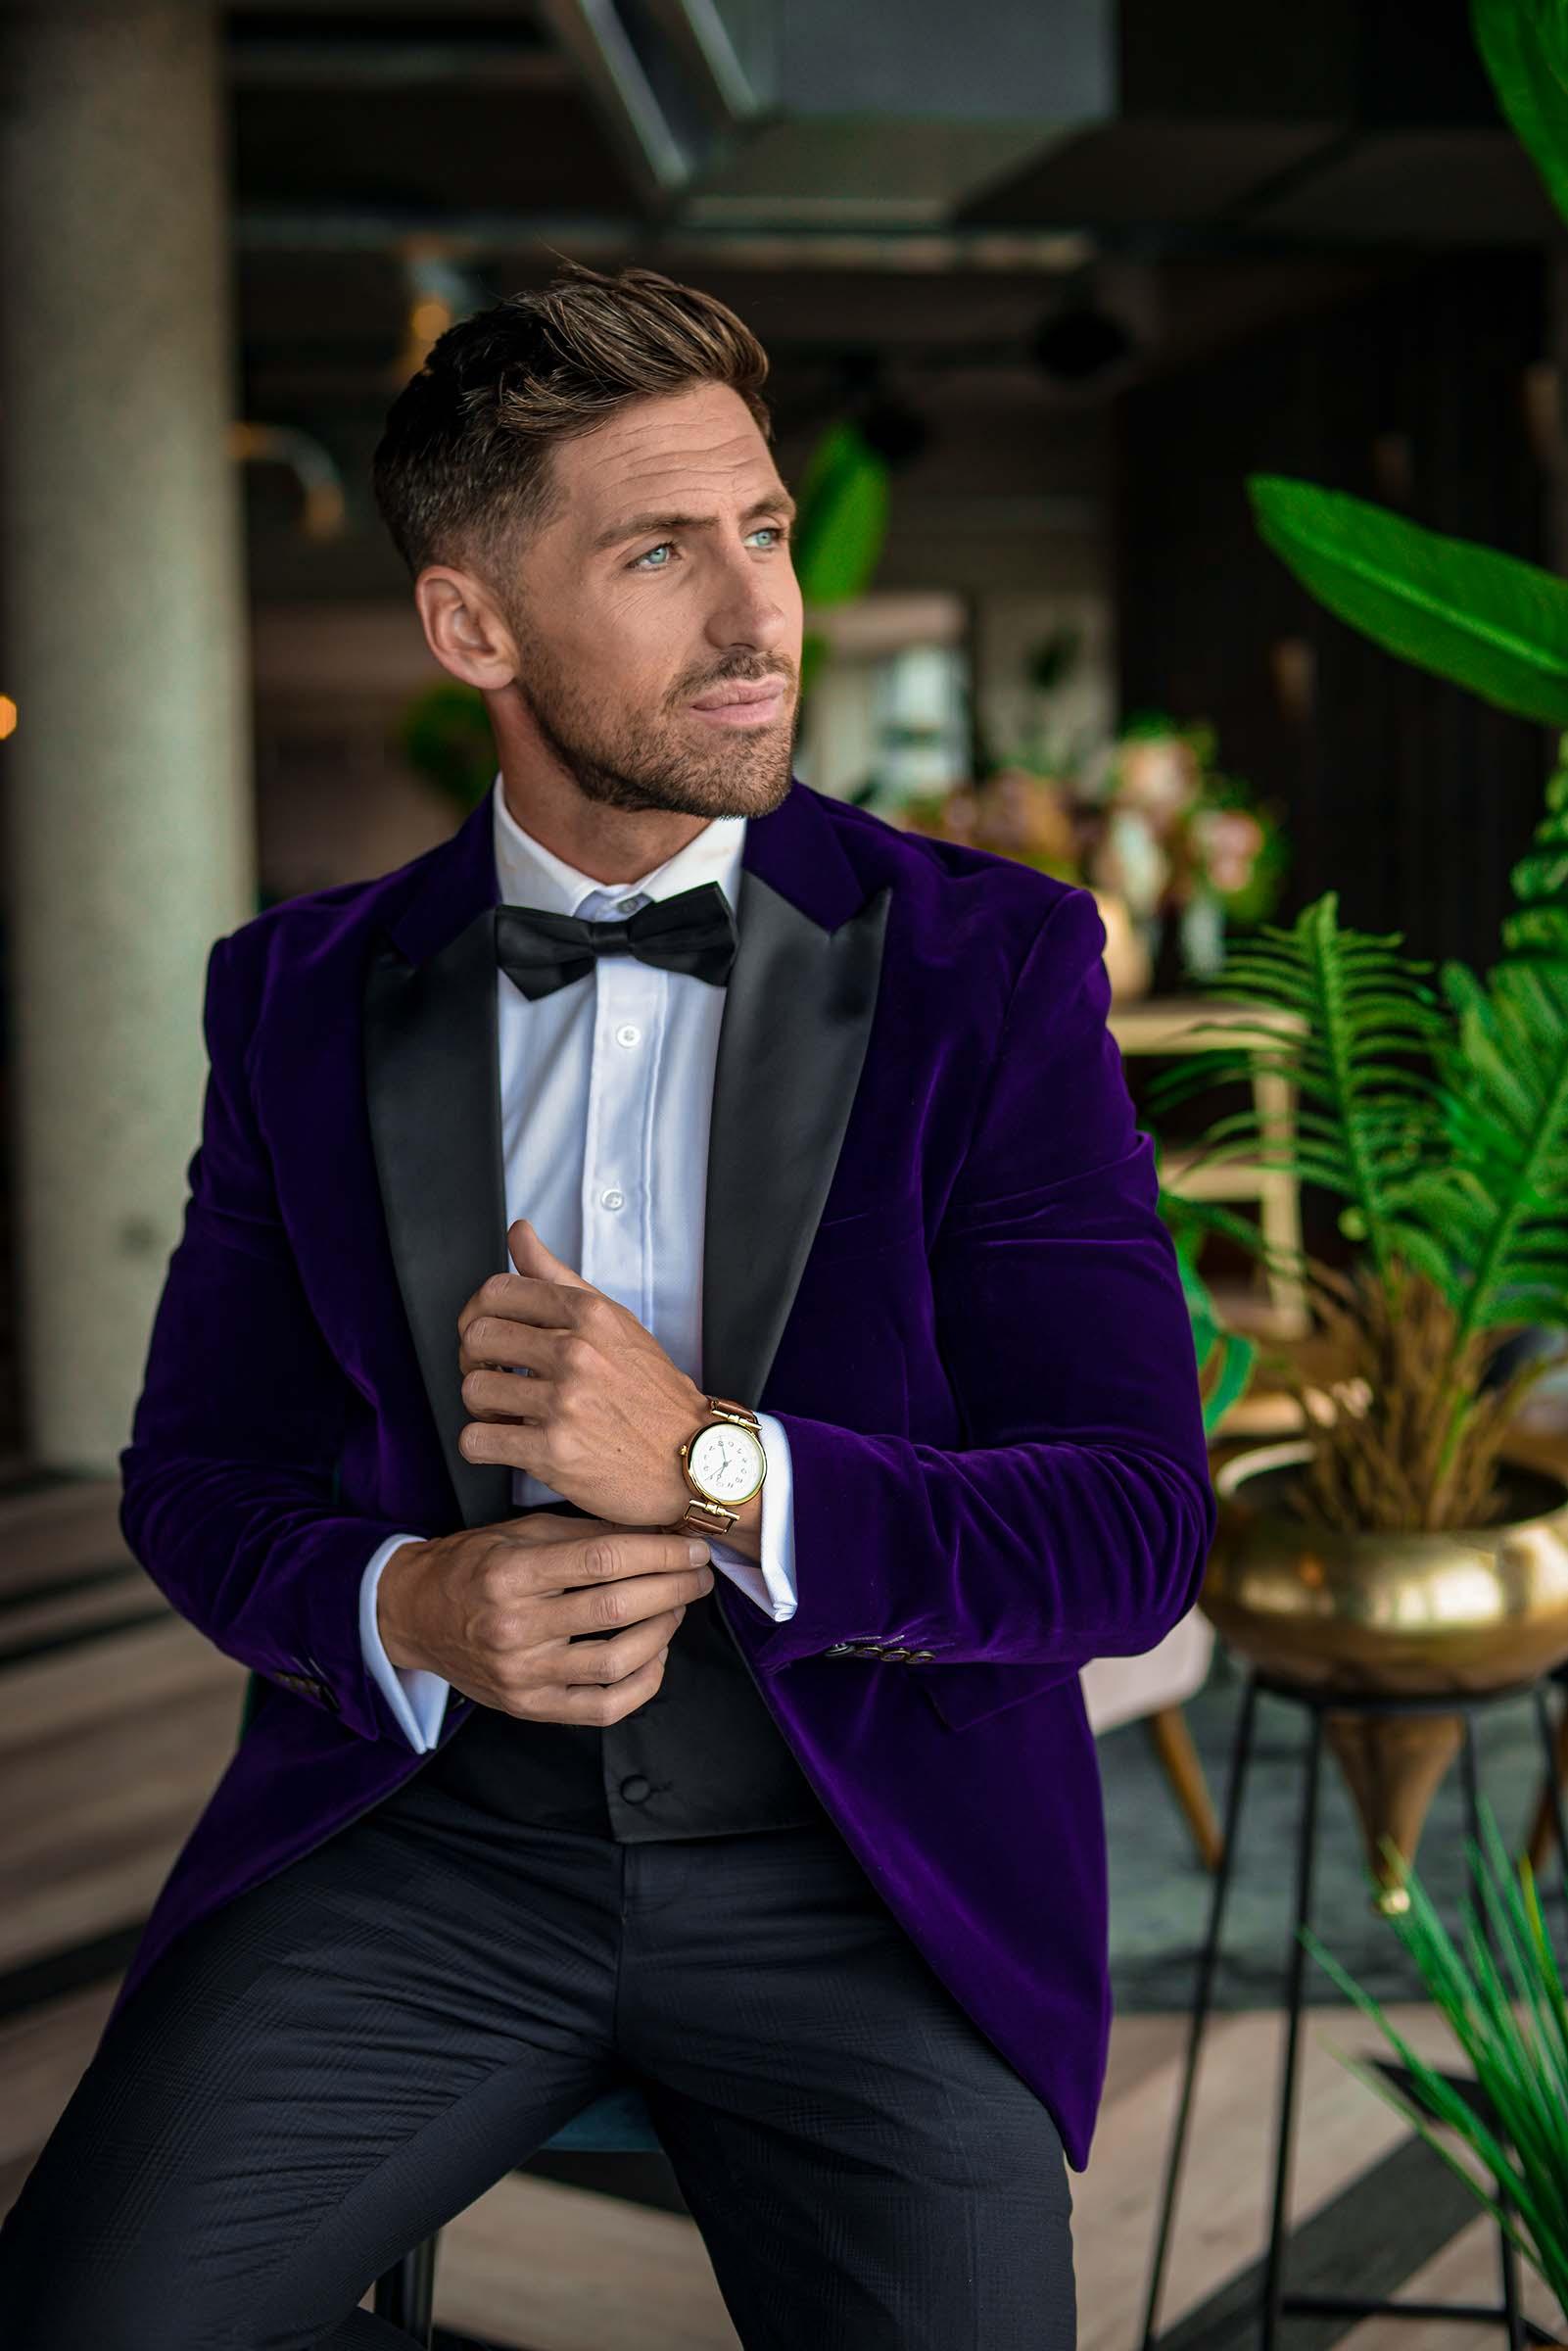 alternative luxe wedding - slytherin wedding - gothic wedding - alternative wedding - purple velvet blazer - velvet groomswear - alternative grooms suit